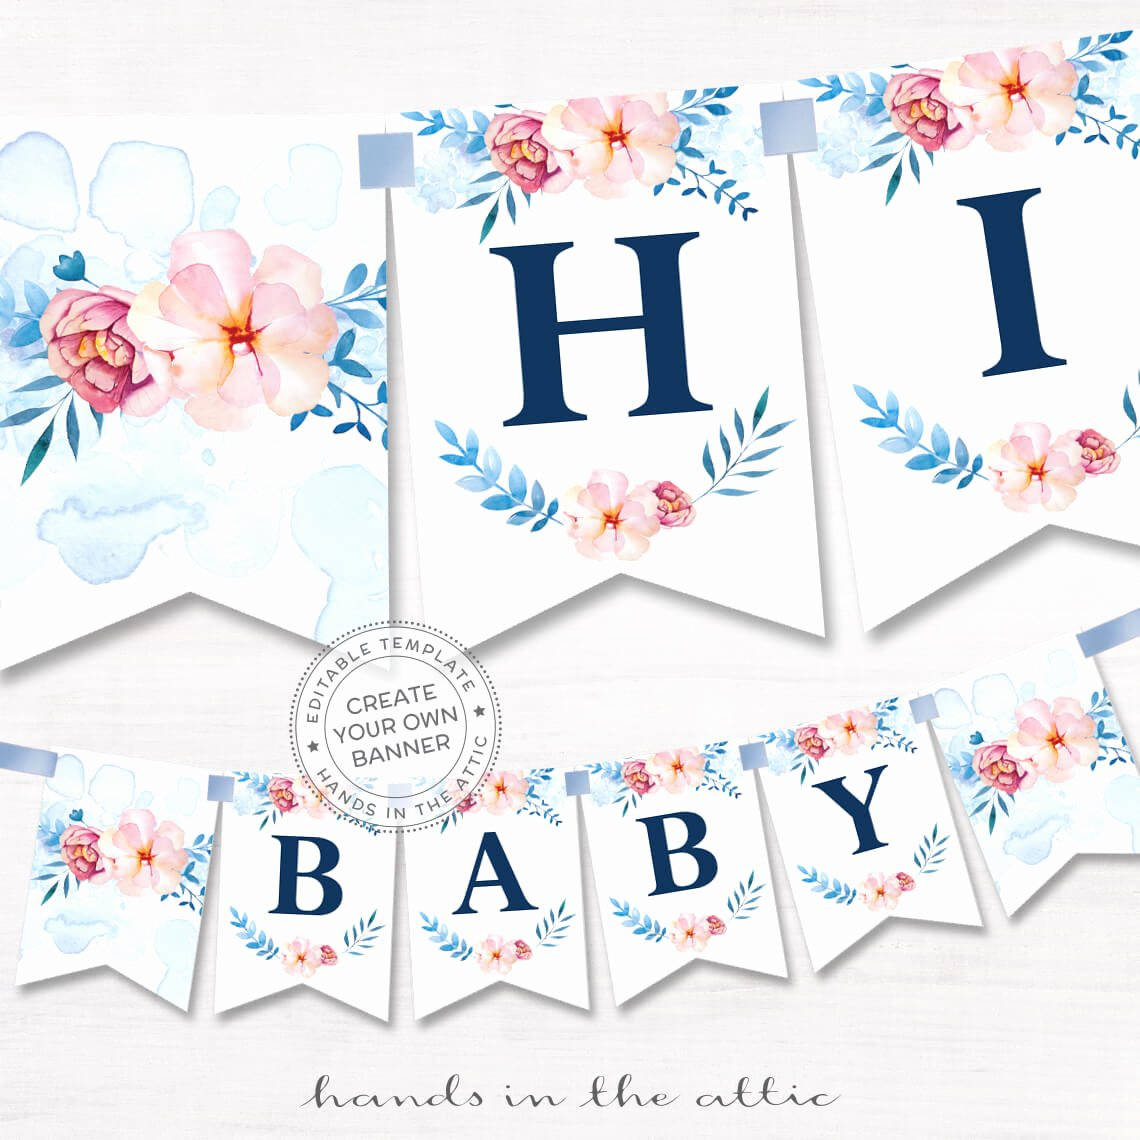 Baby Shower Banner Template Inspirational Floral Alphabet Banner Diy Template